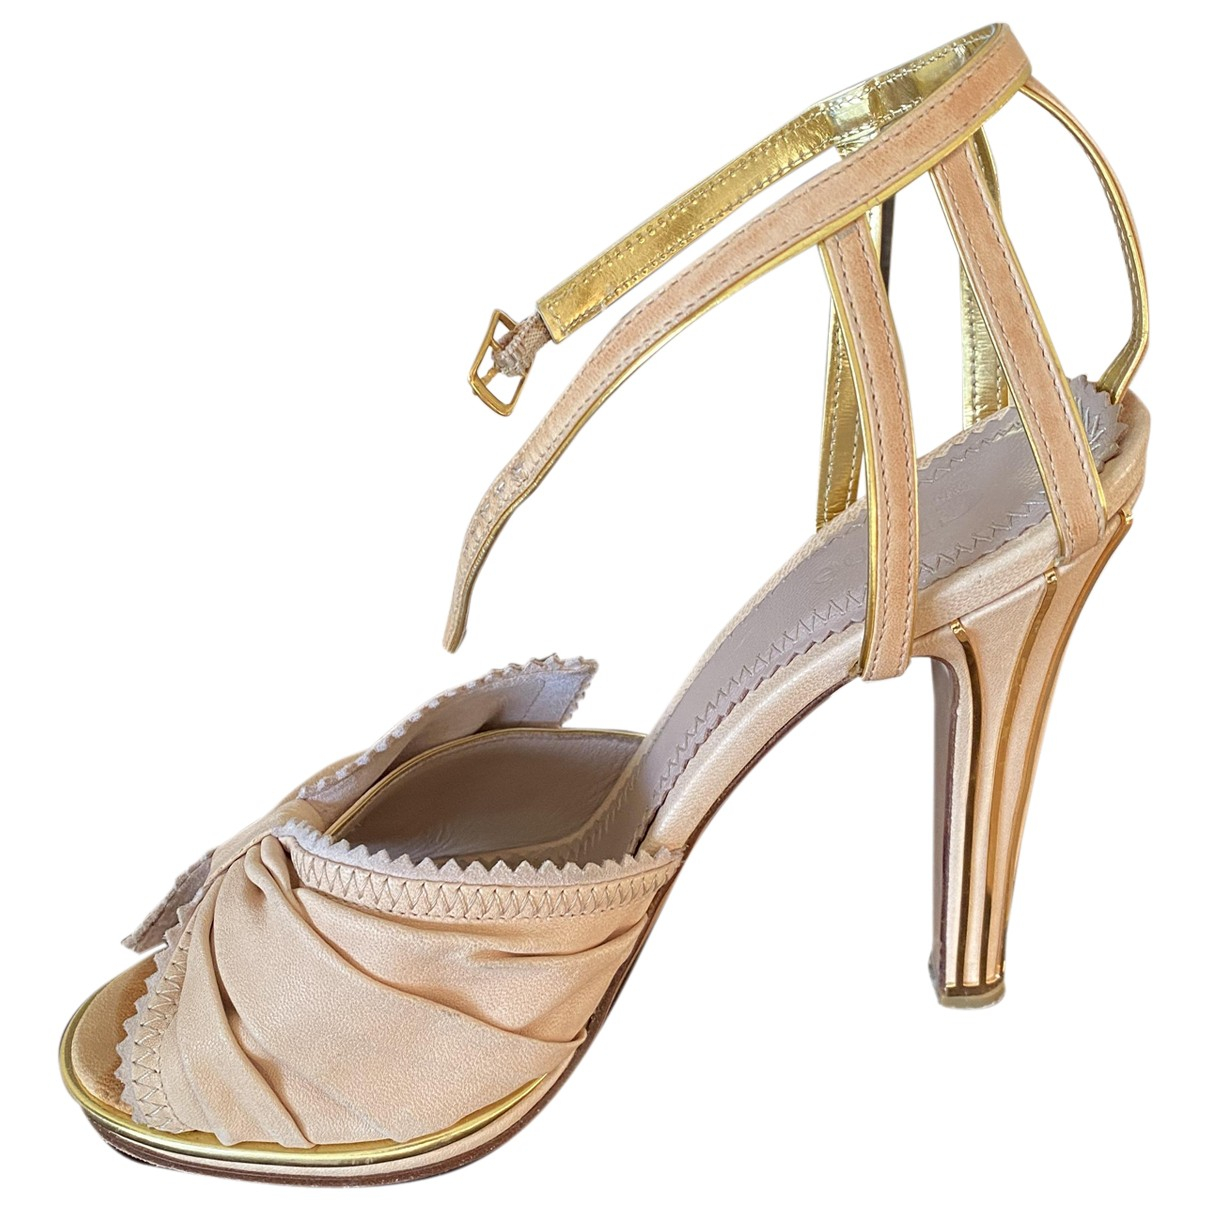 Chloé \N Beige Shearling Sandals for Women 37 EU